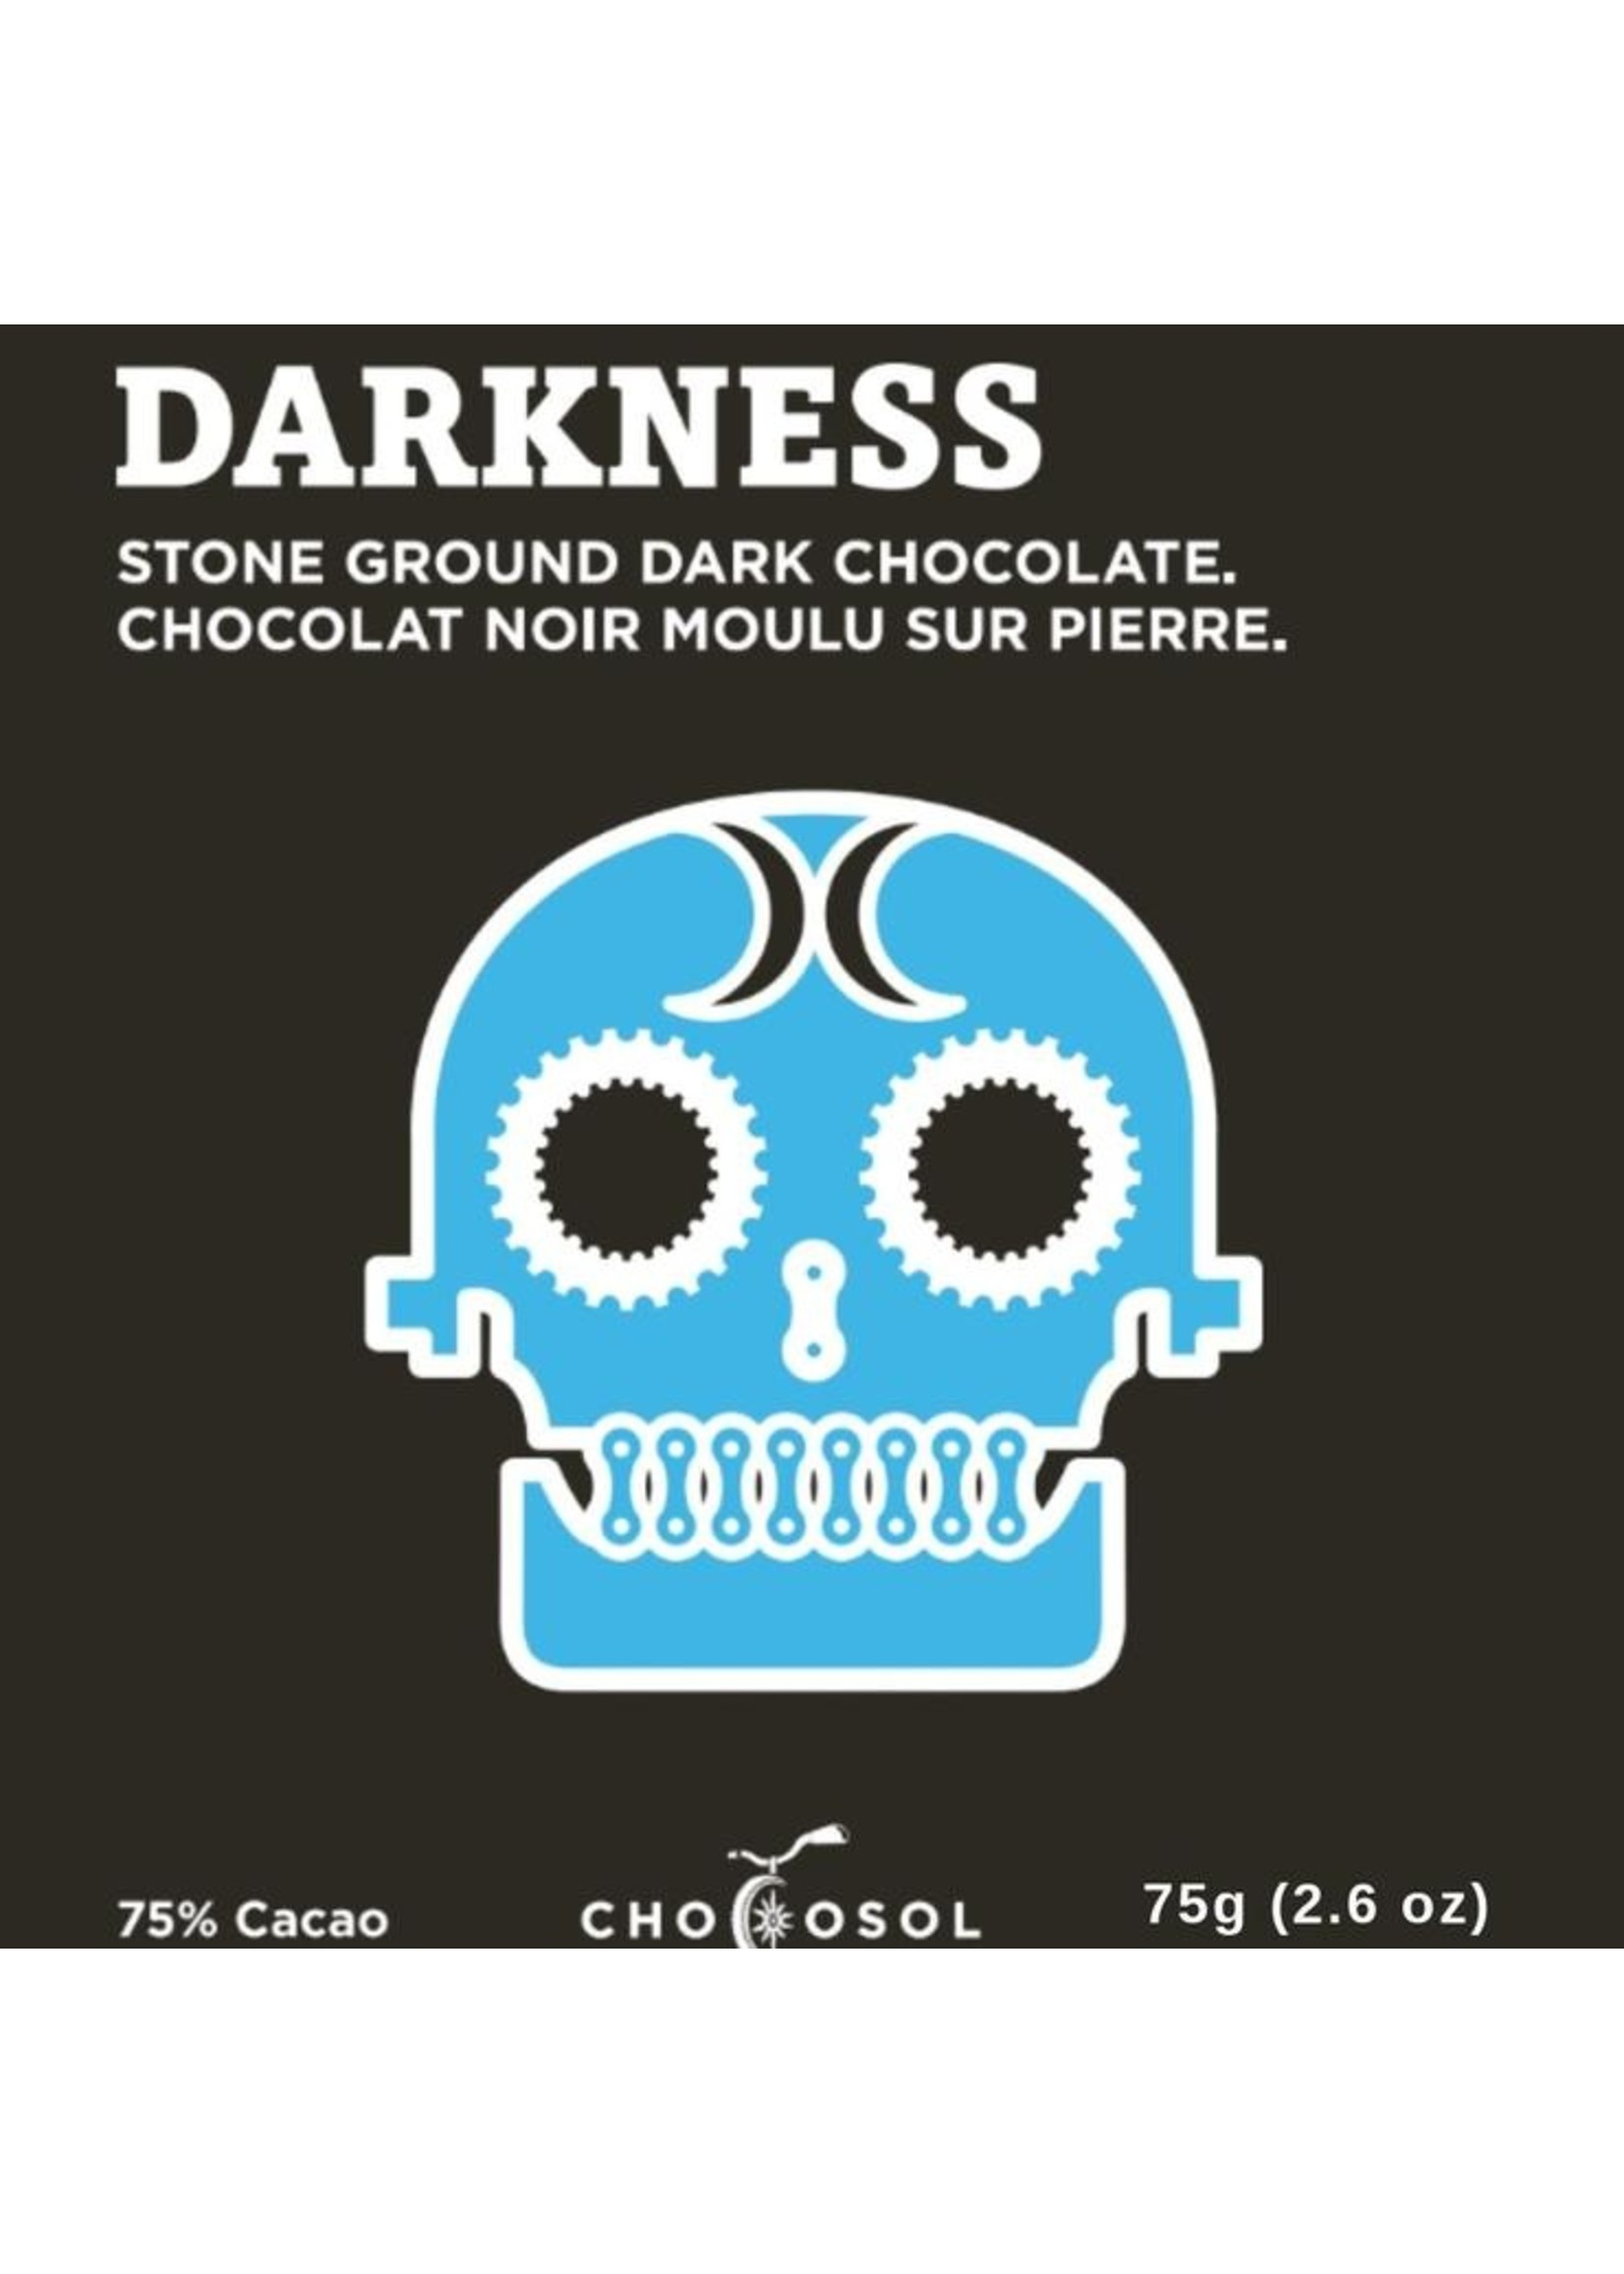 Chocosol Darkness Chocosol